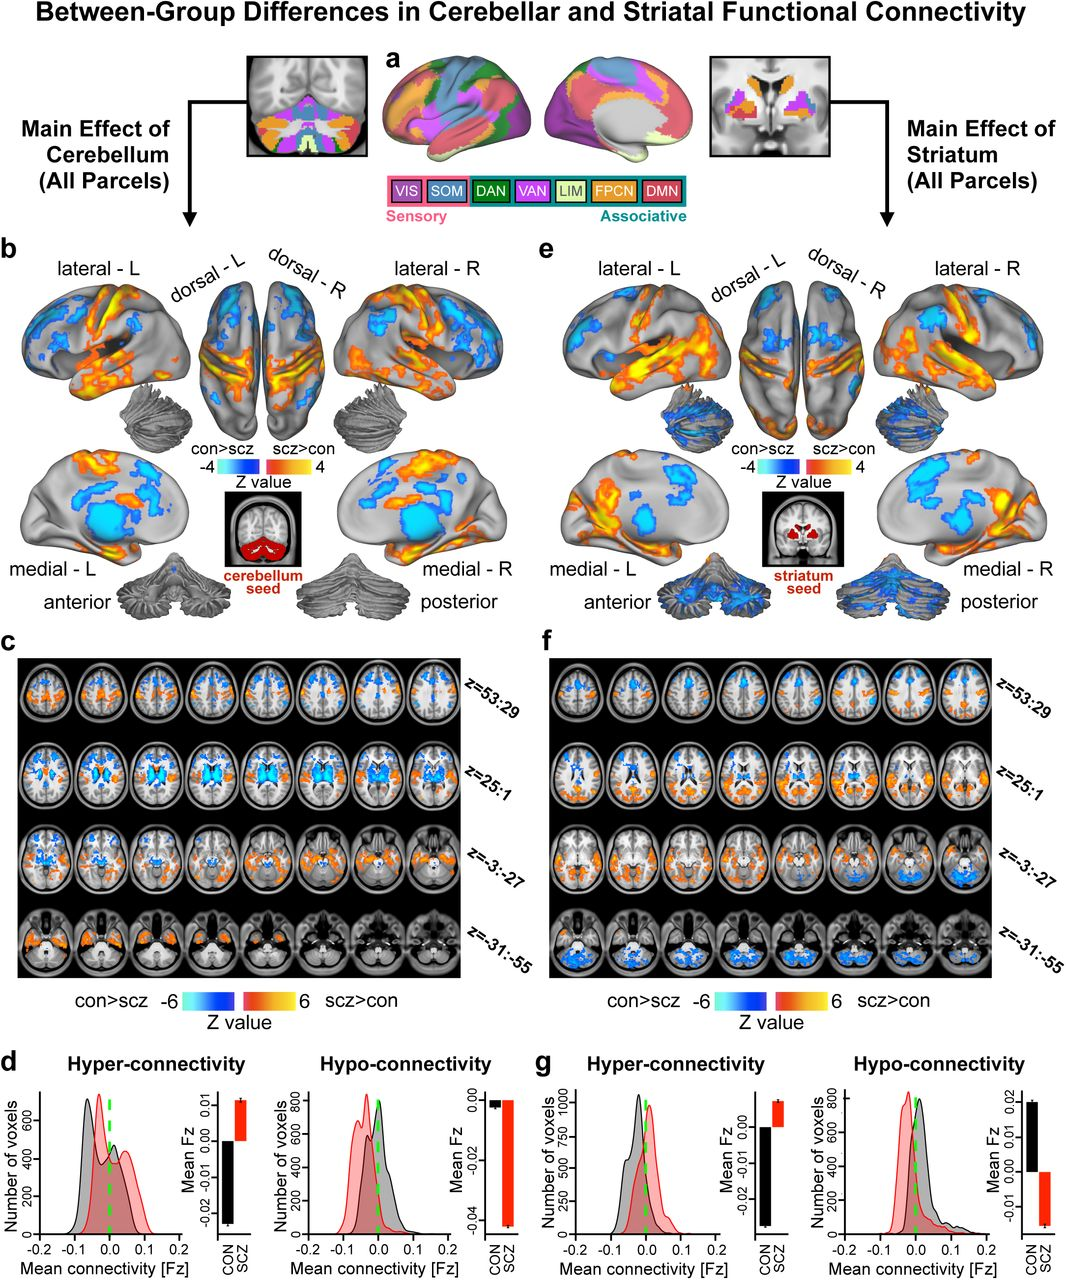 Schizophrenia Exhibits Bi-Directional Brain-Wide Alterations in